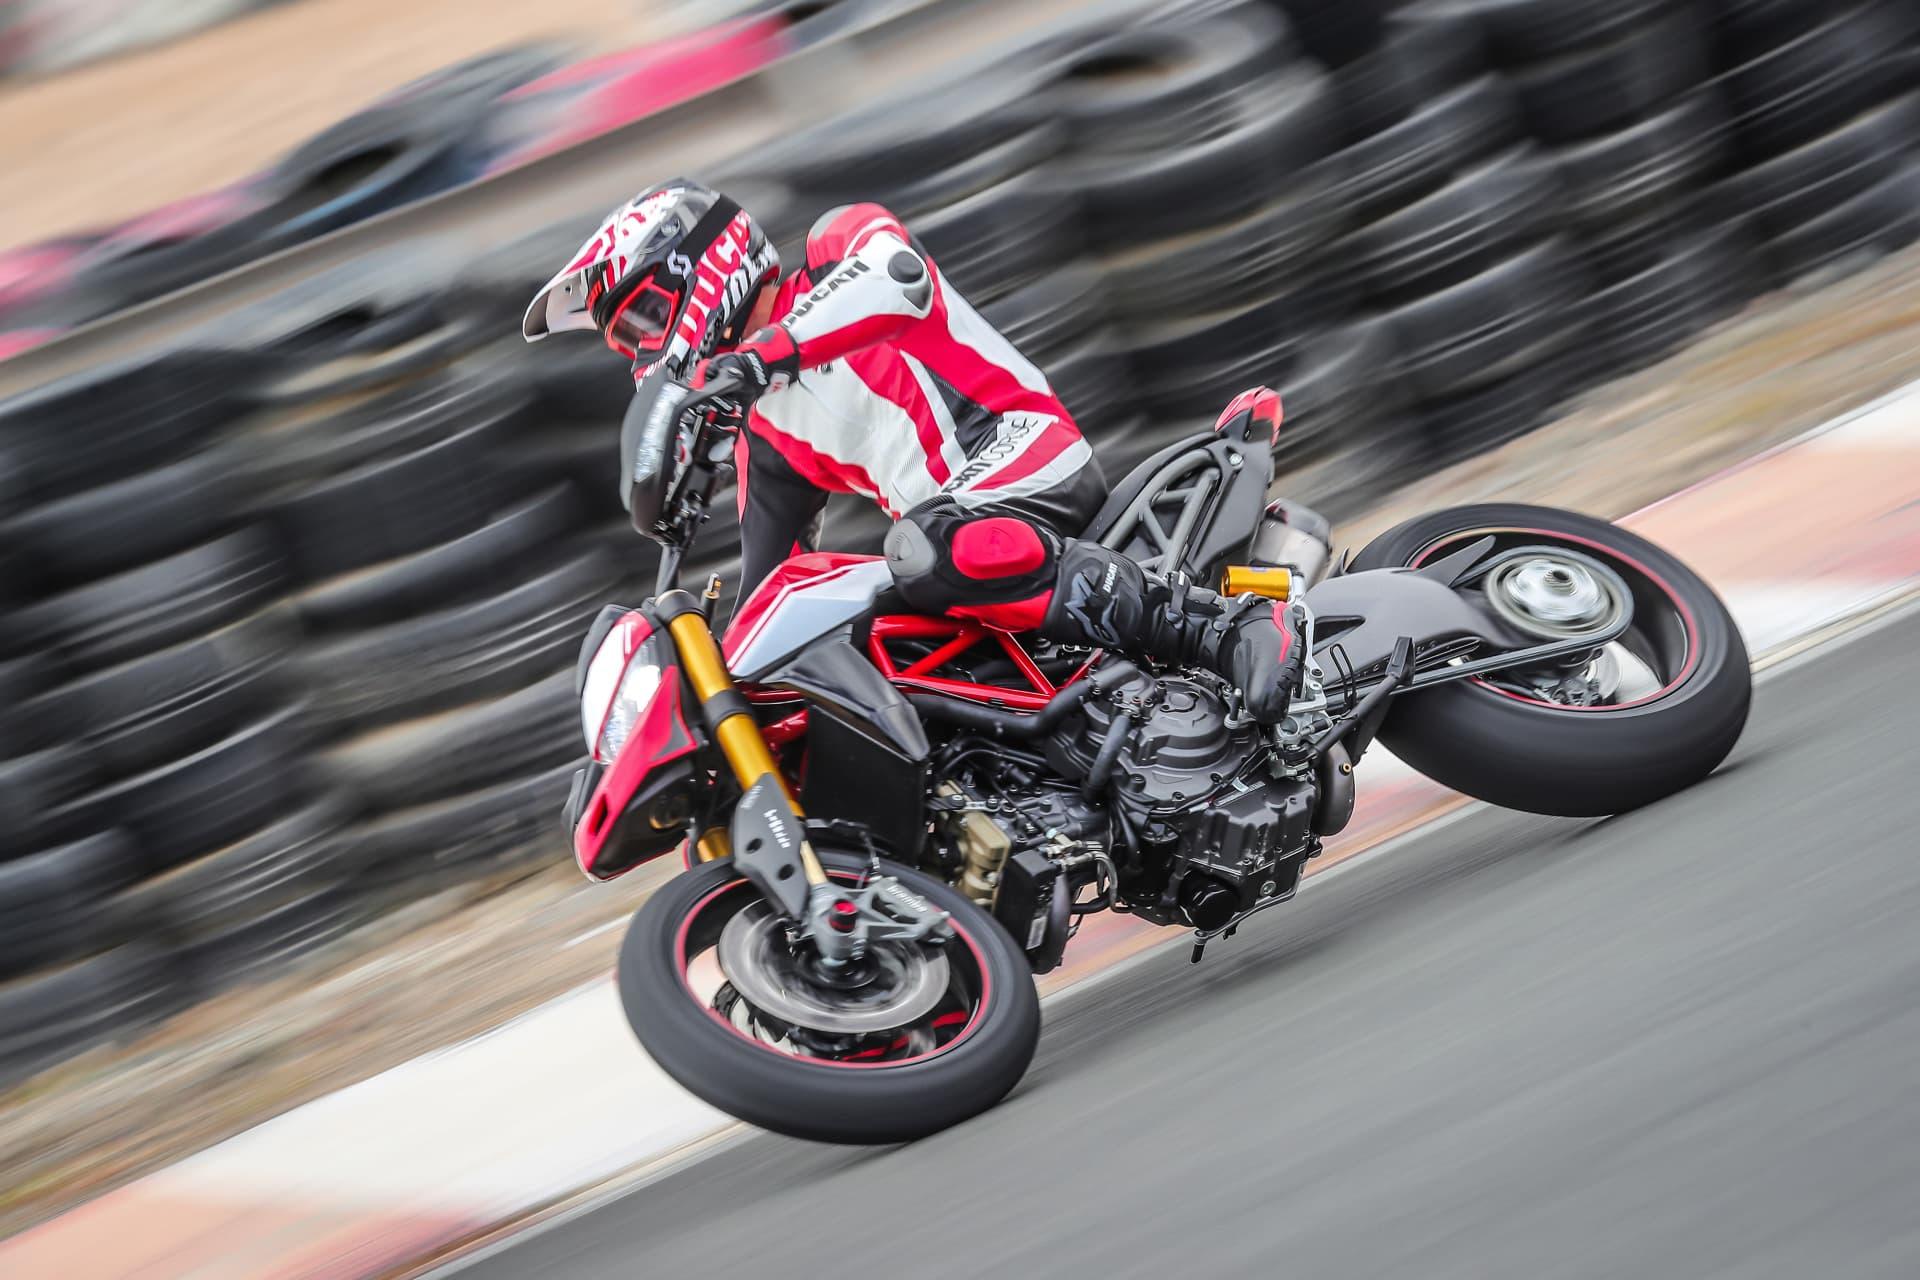 Ducati Hypermotard 950 Sp Performance 12 Uc70341 Mid